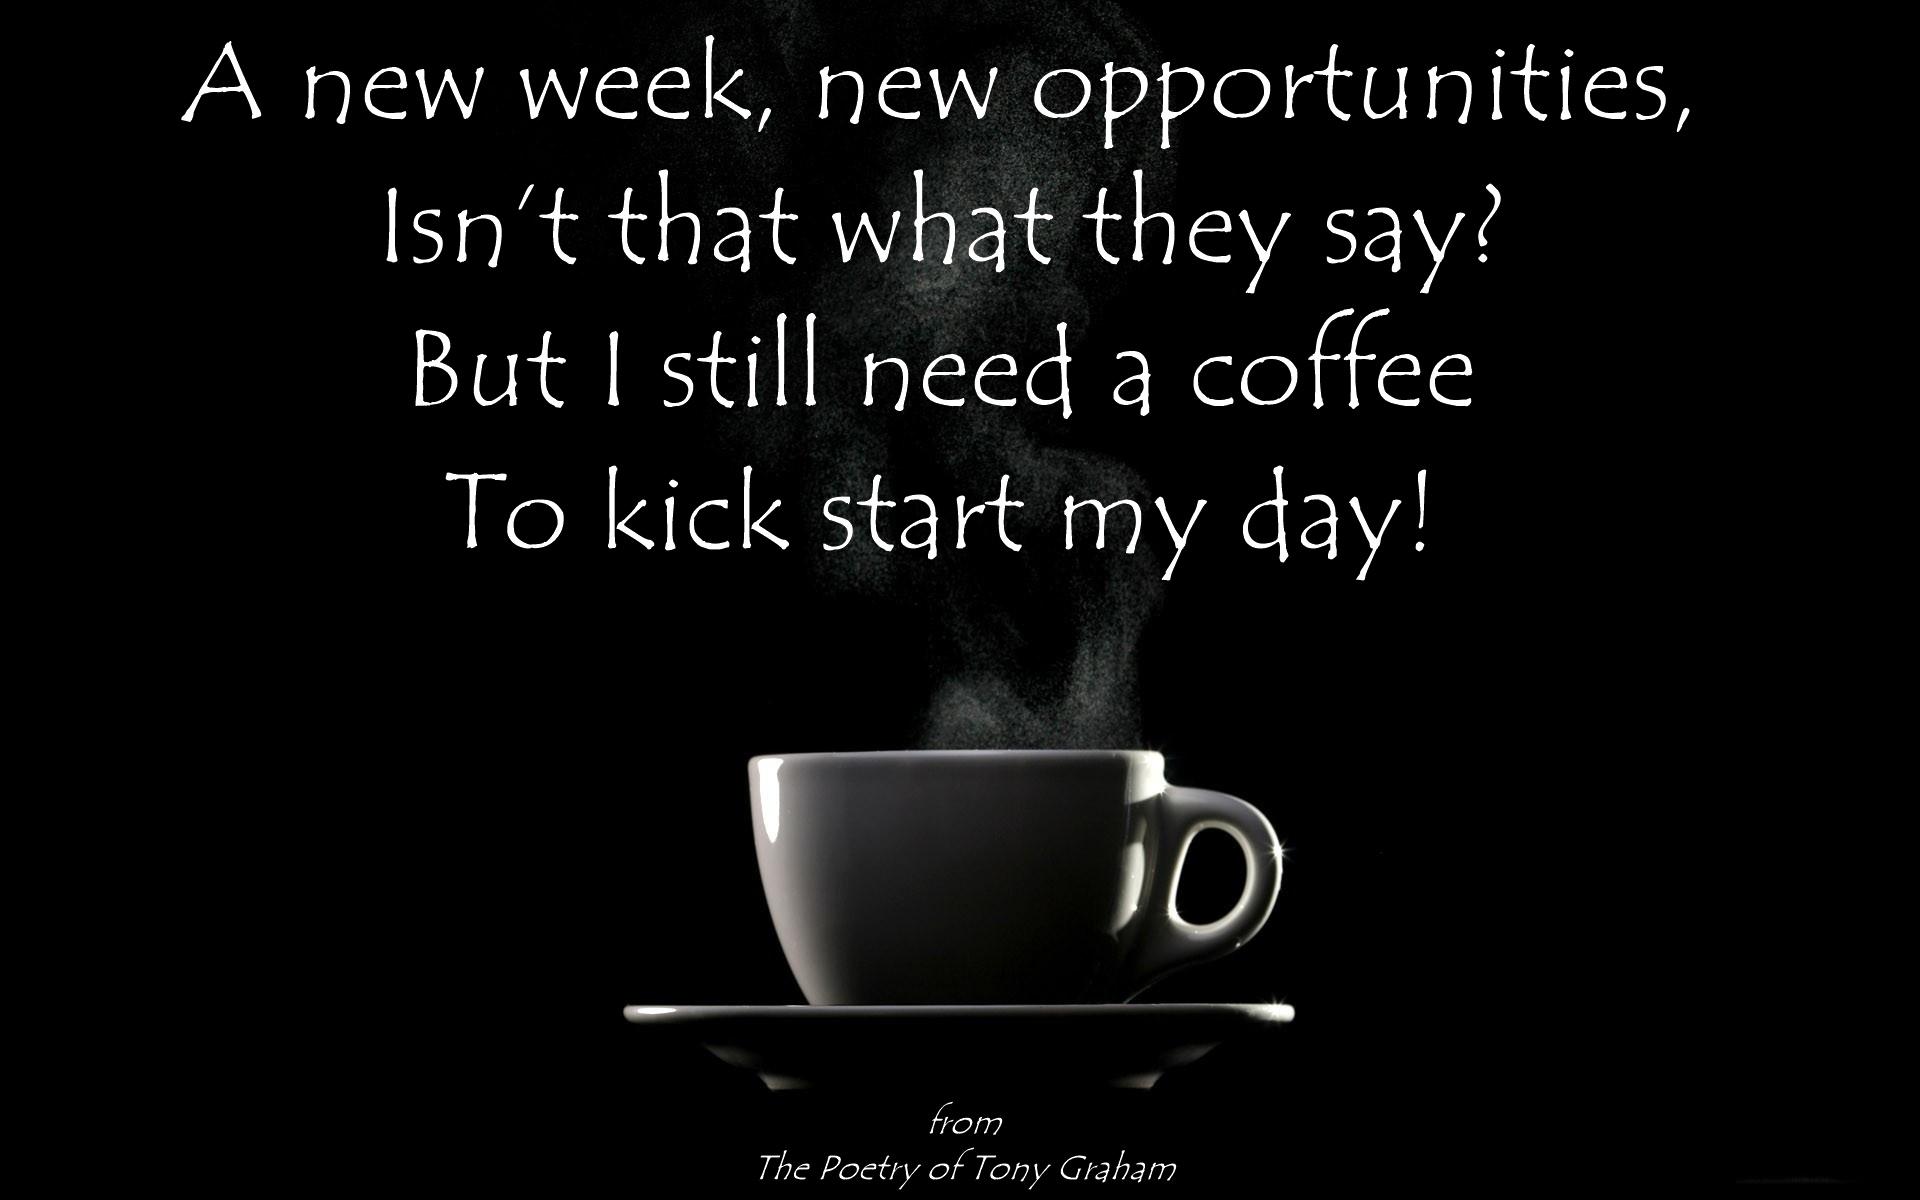 TPOTG Morning Coffee 02